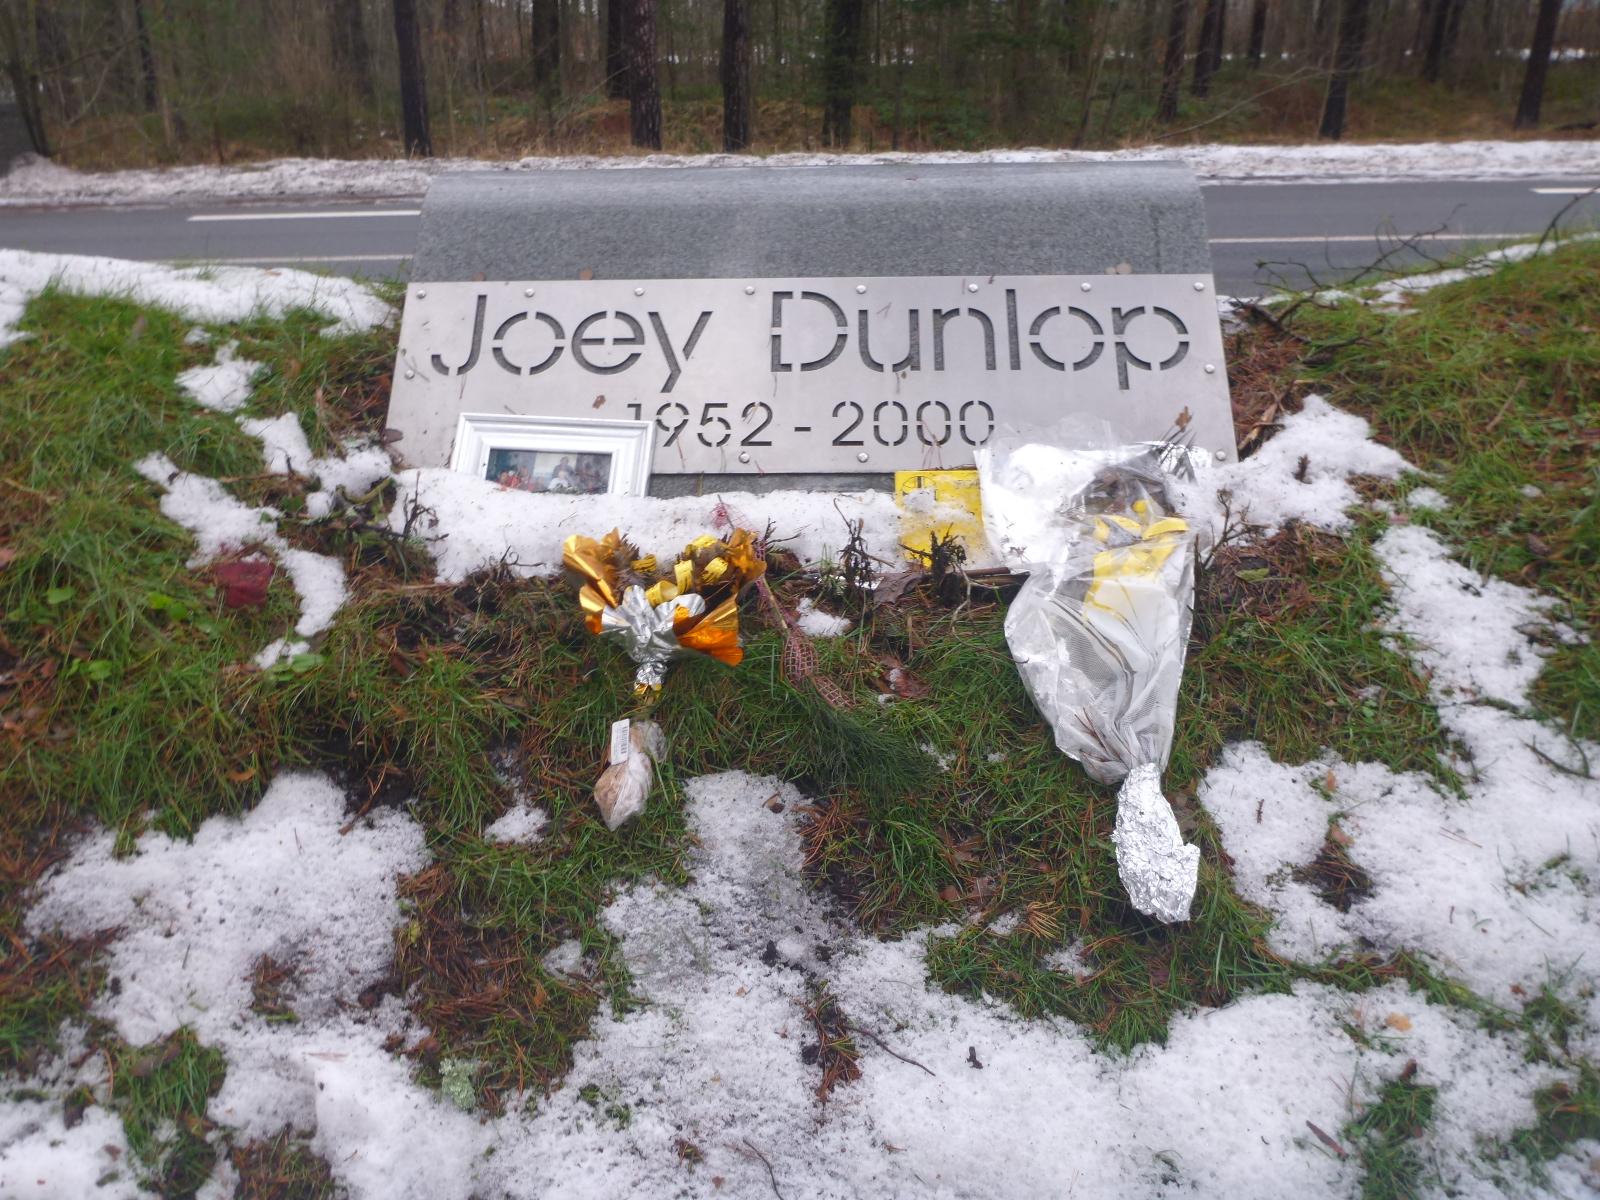 getting to joey dunlop memorial